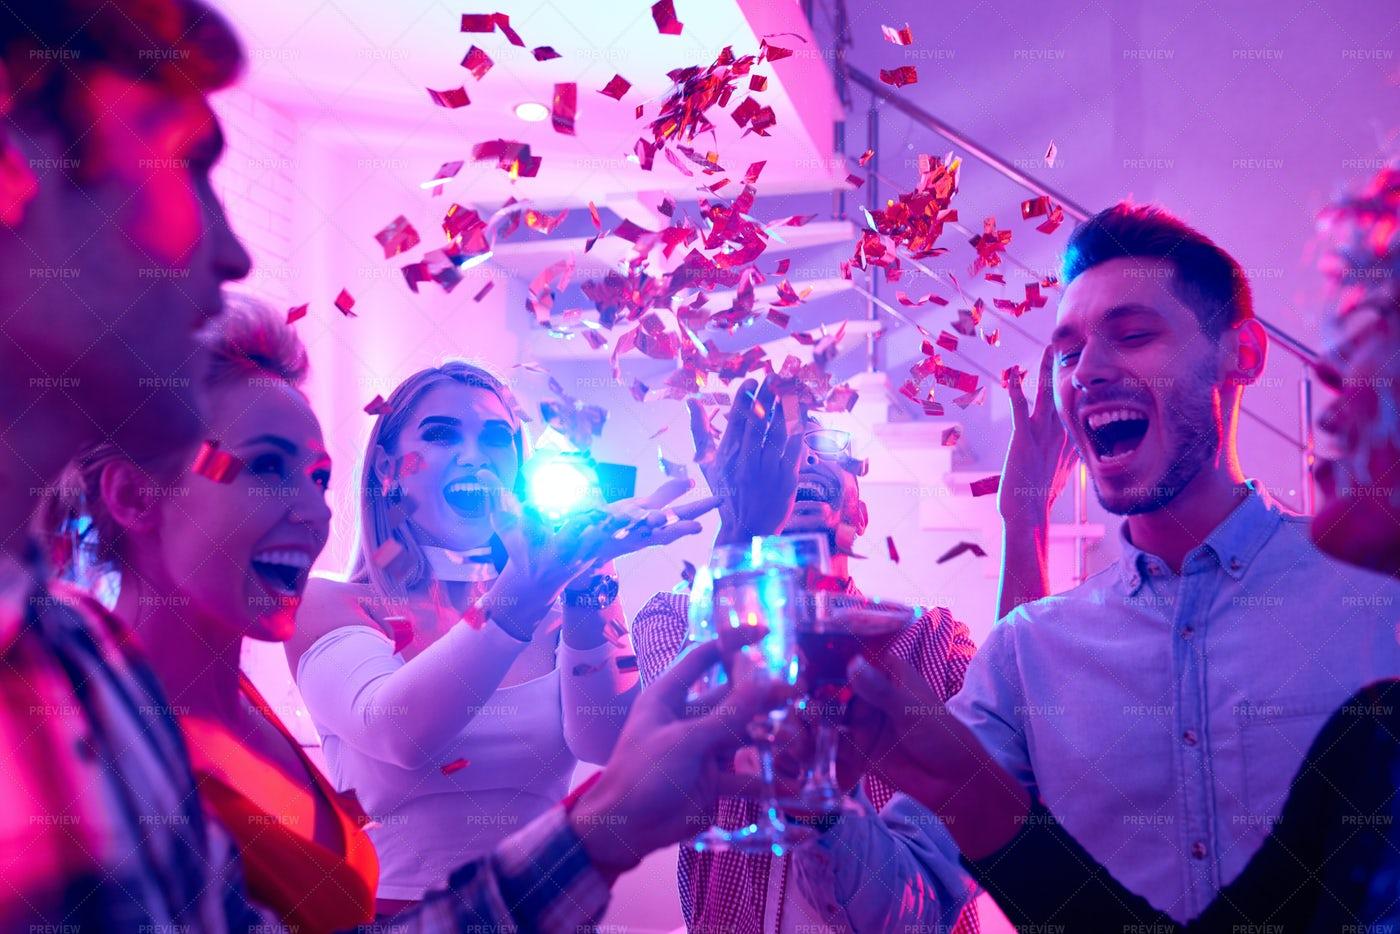 Holiday Celebration At Party: Stock Photos